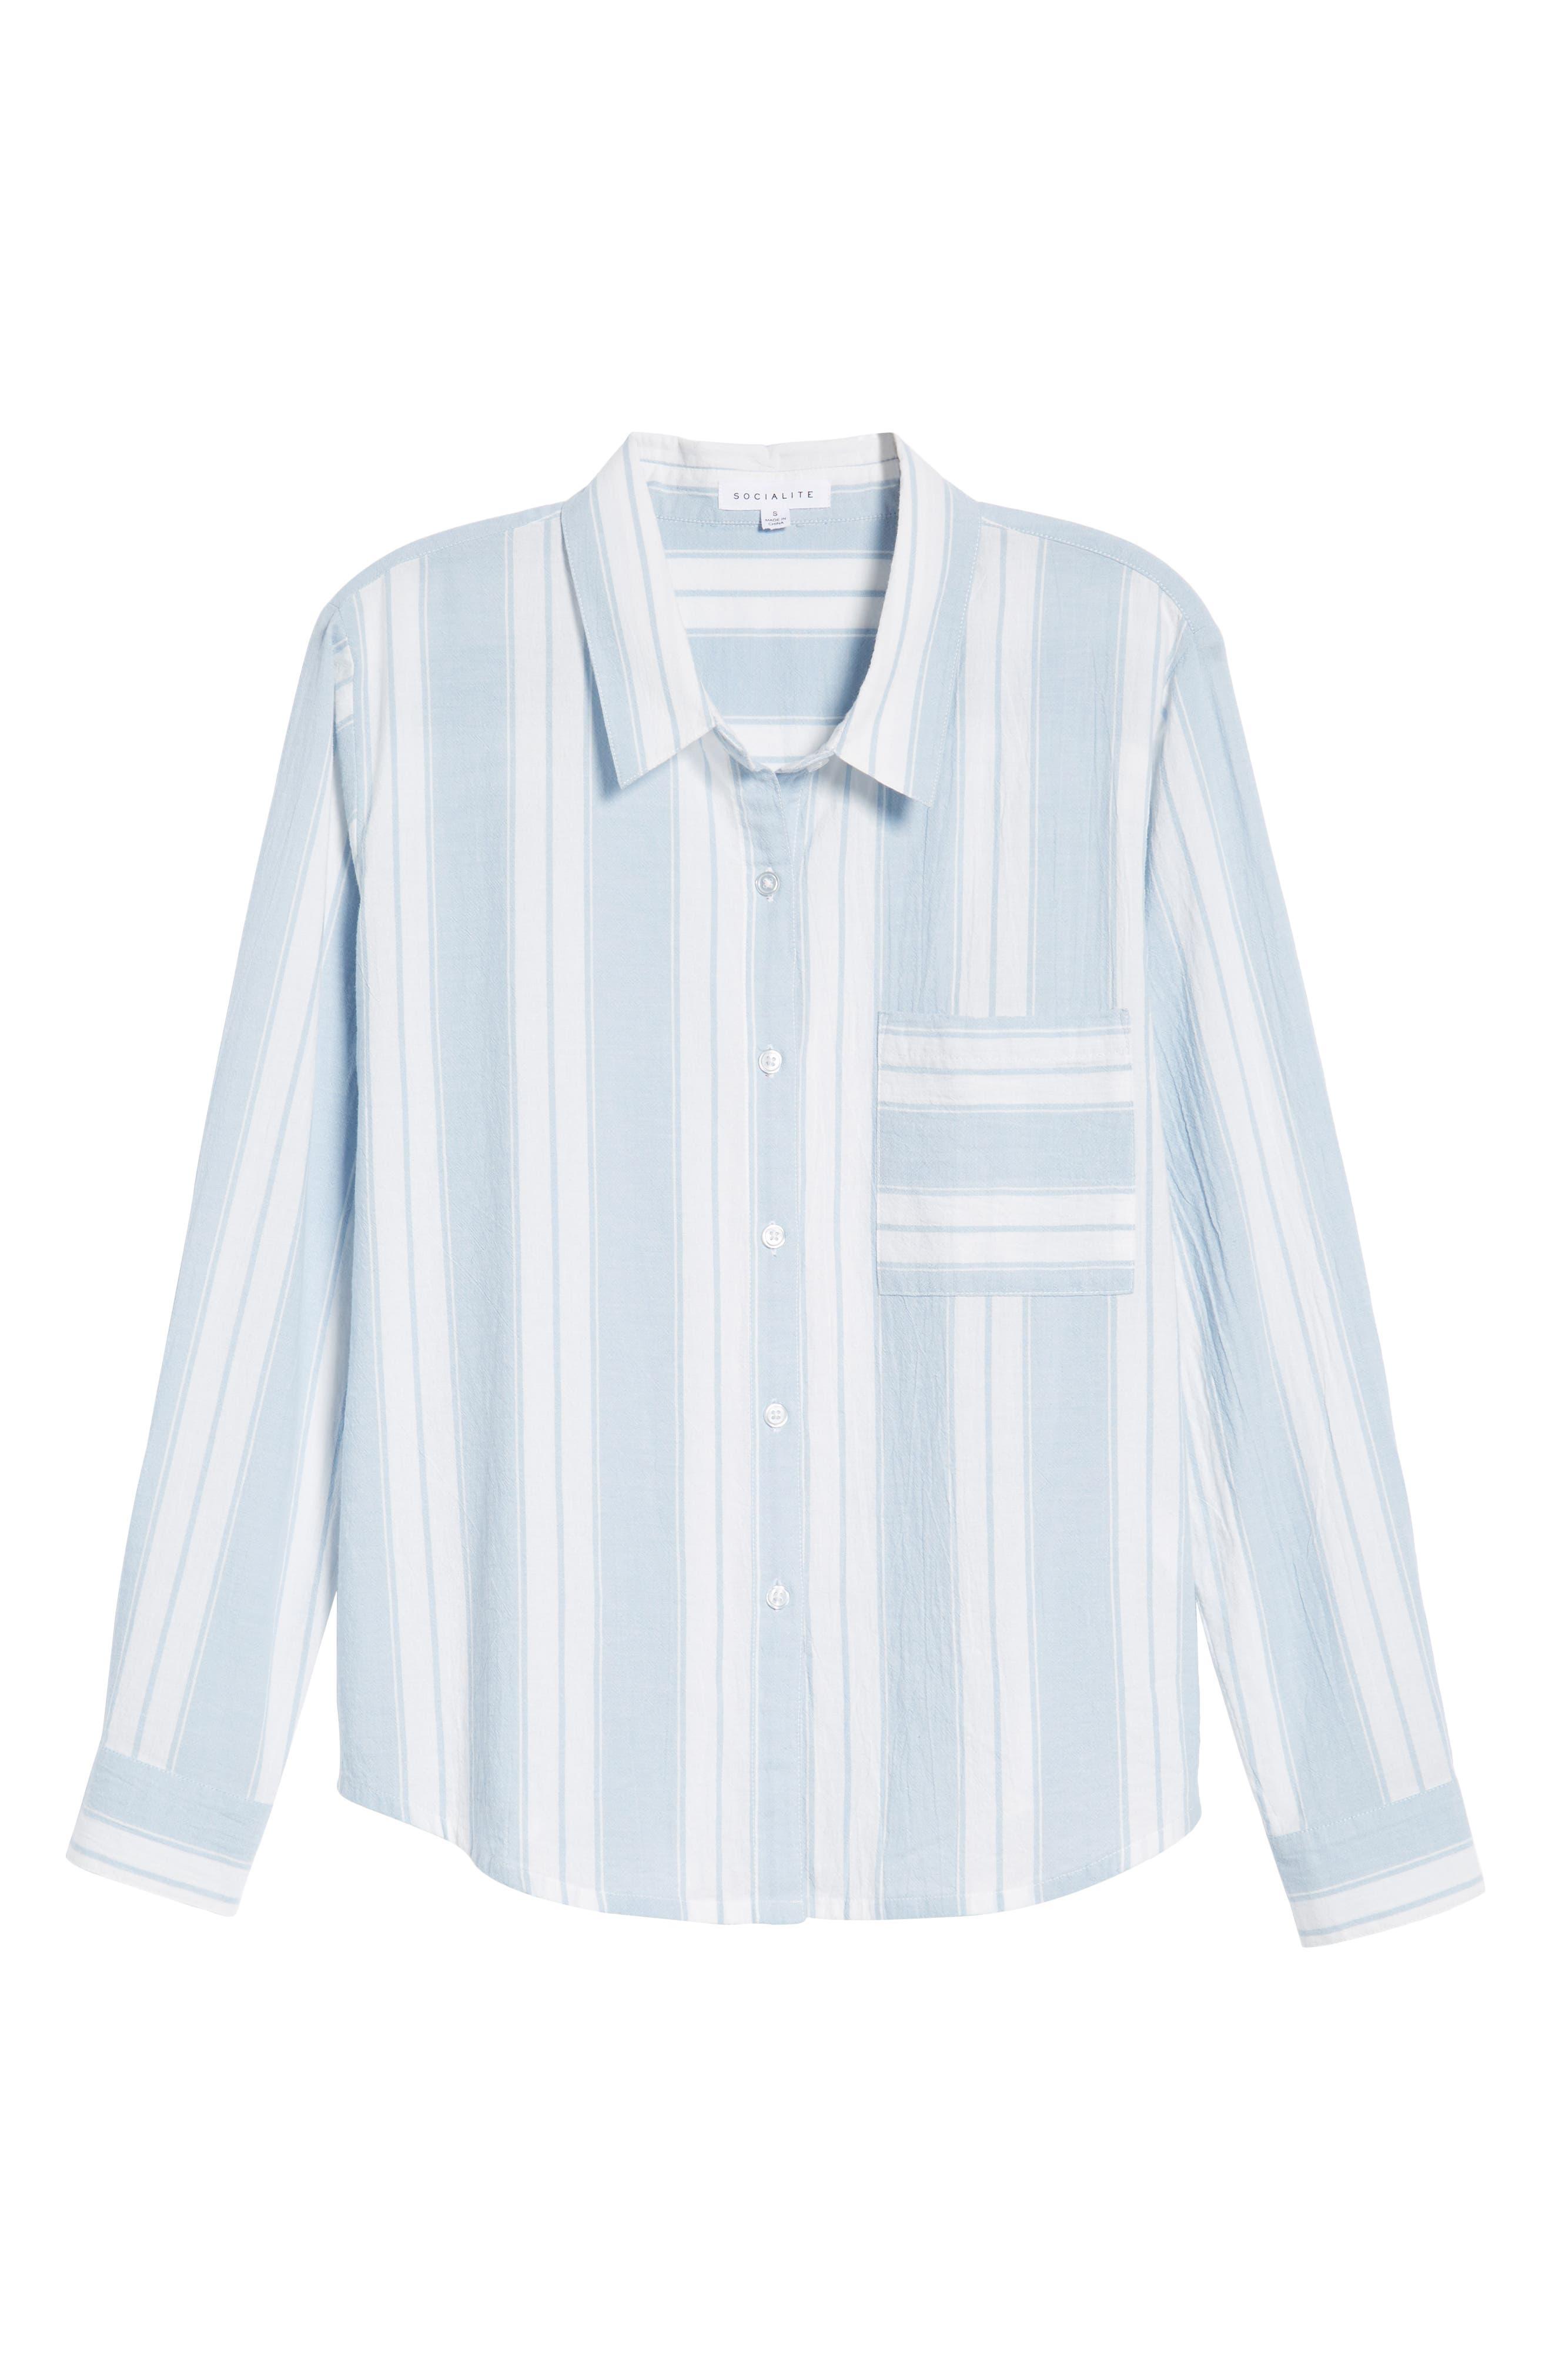 Bleach Stripe Chambray Top,                             Alternate thumbnail 7, color,                             Blue/ White